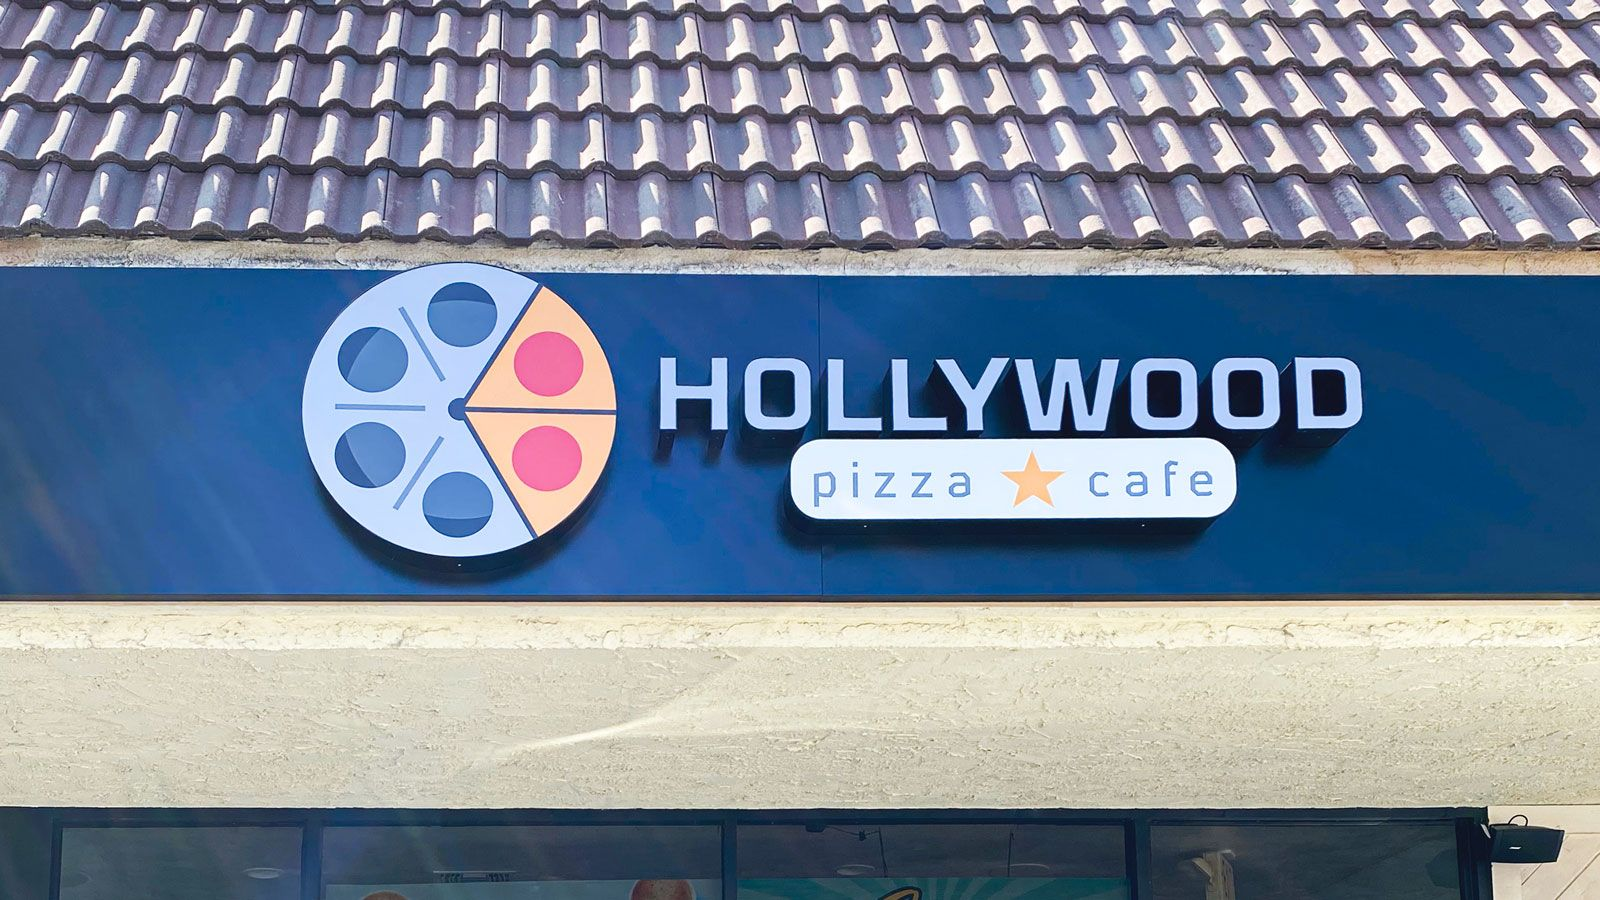 Hollywood cafe illuminated signs